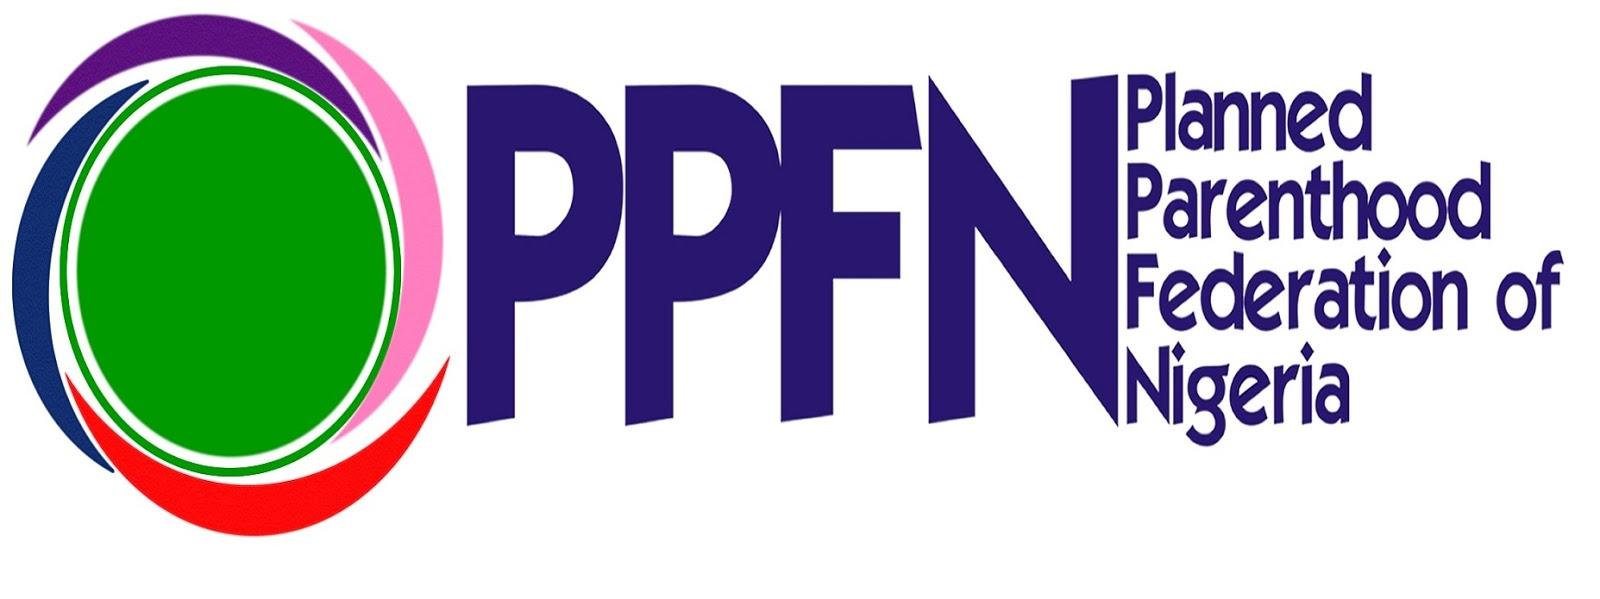 PPFN Recruitment Portal 2018